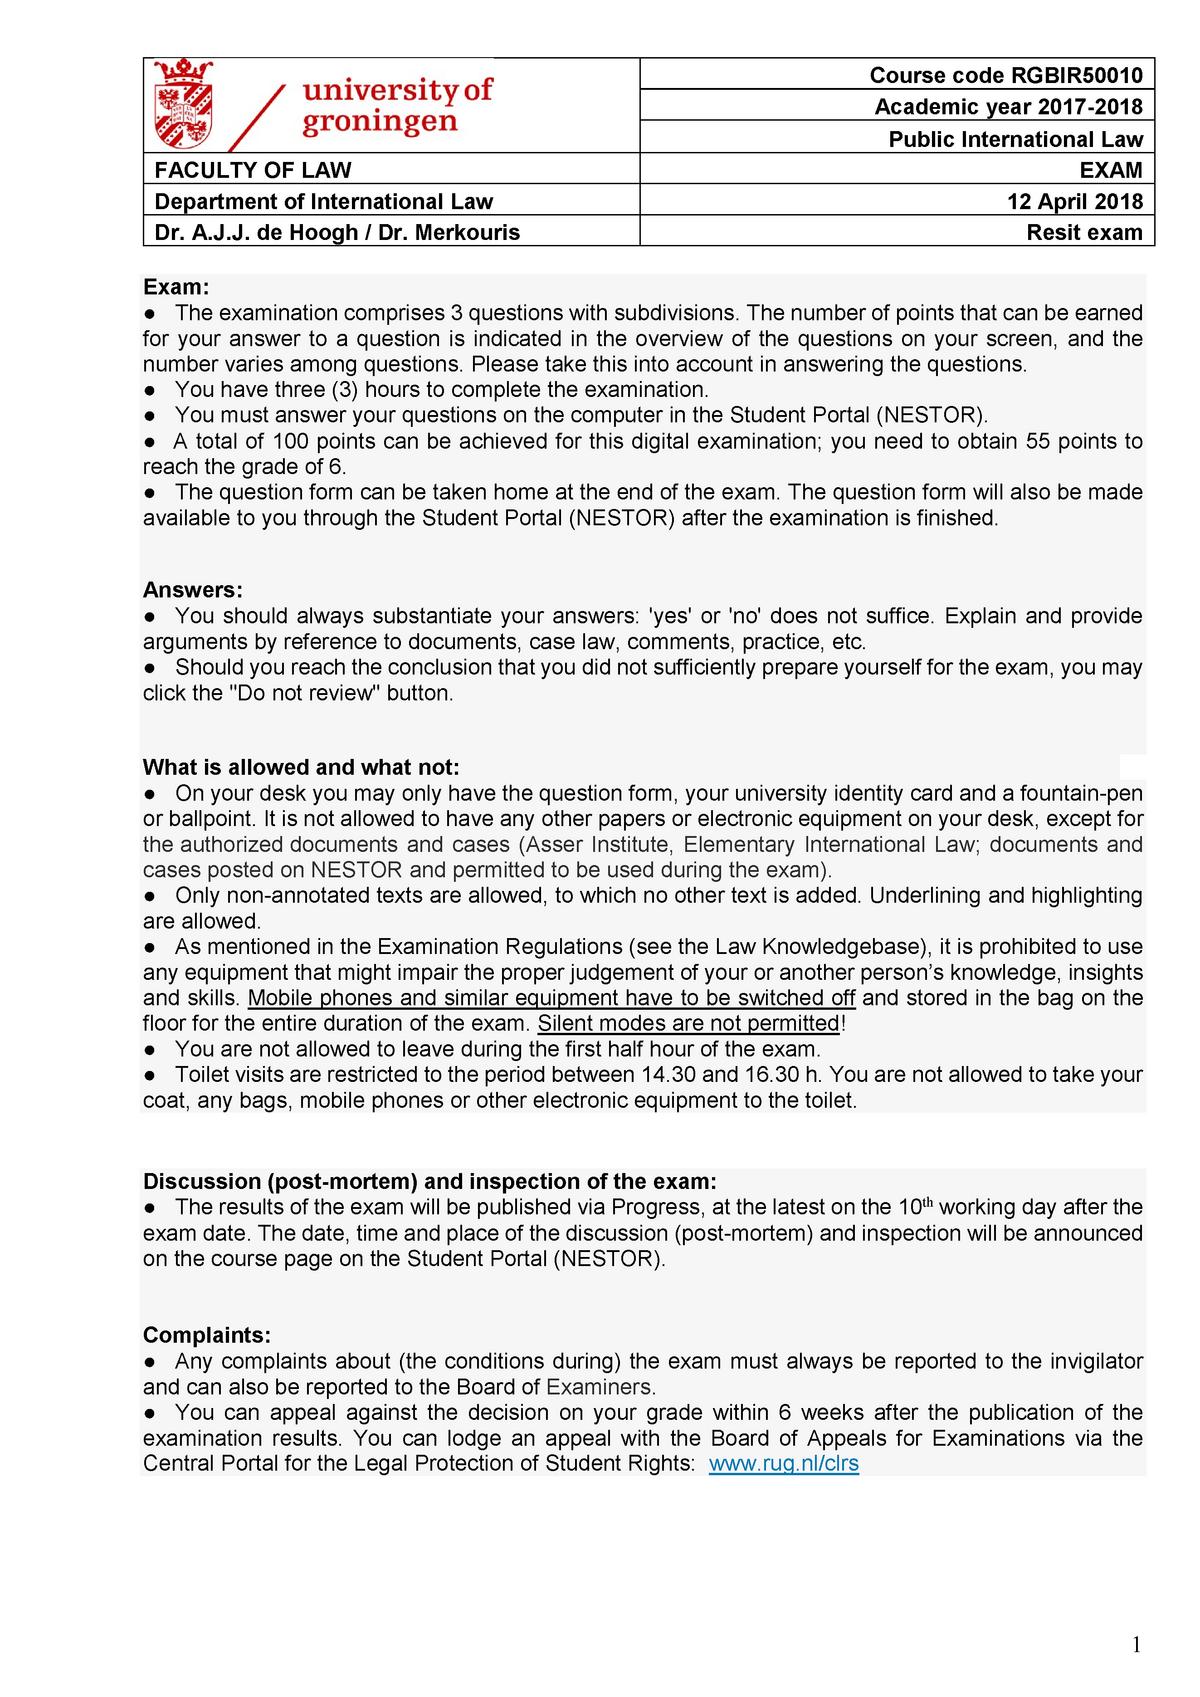 Exam 2018 - RGBIR50010: Public International Law - StuDocu